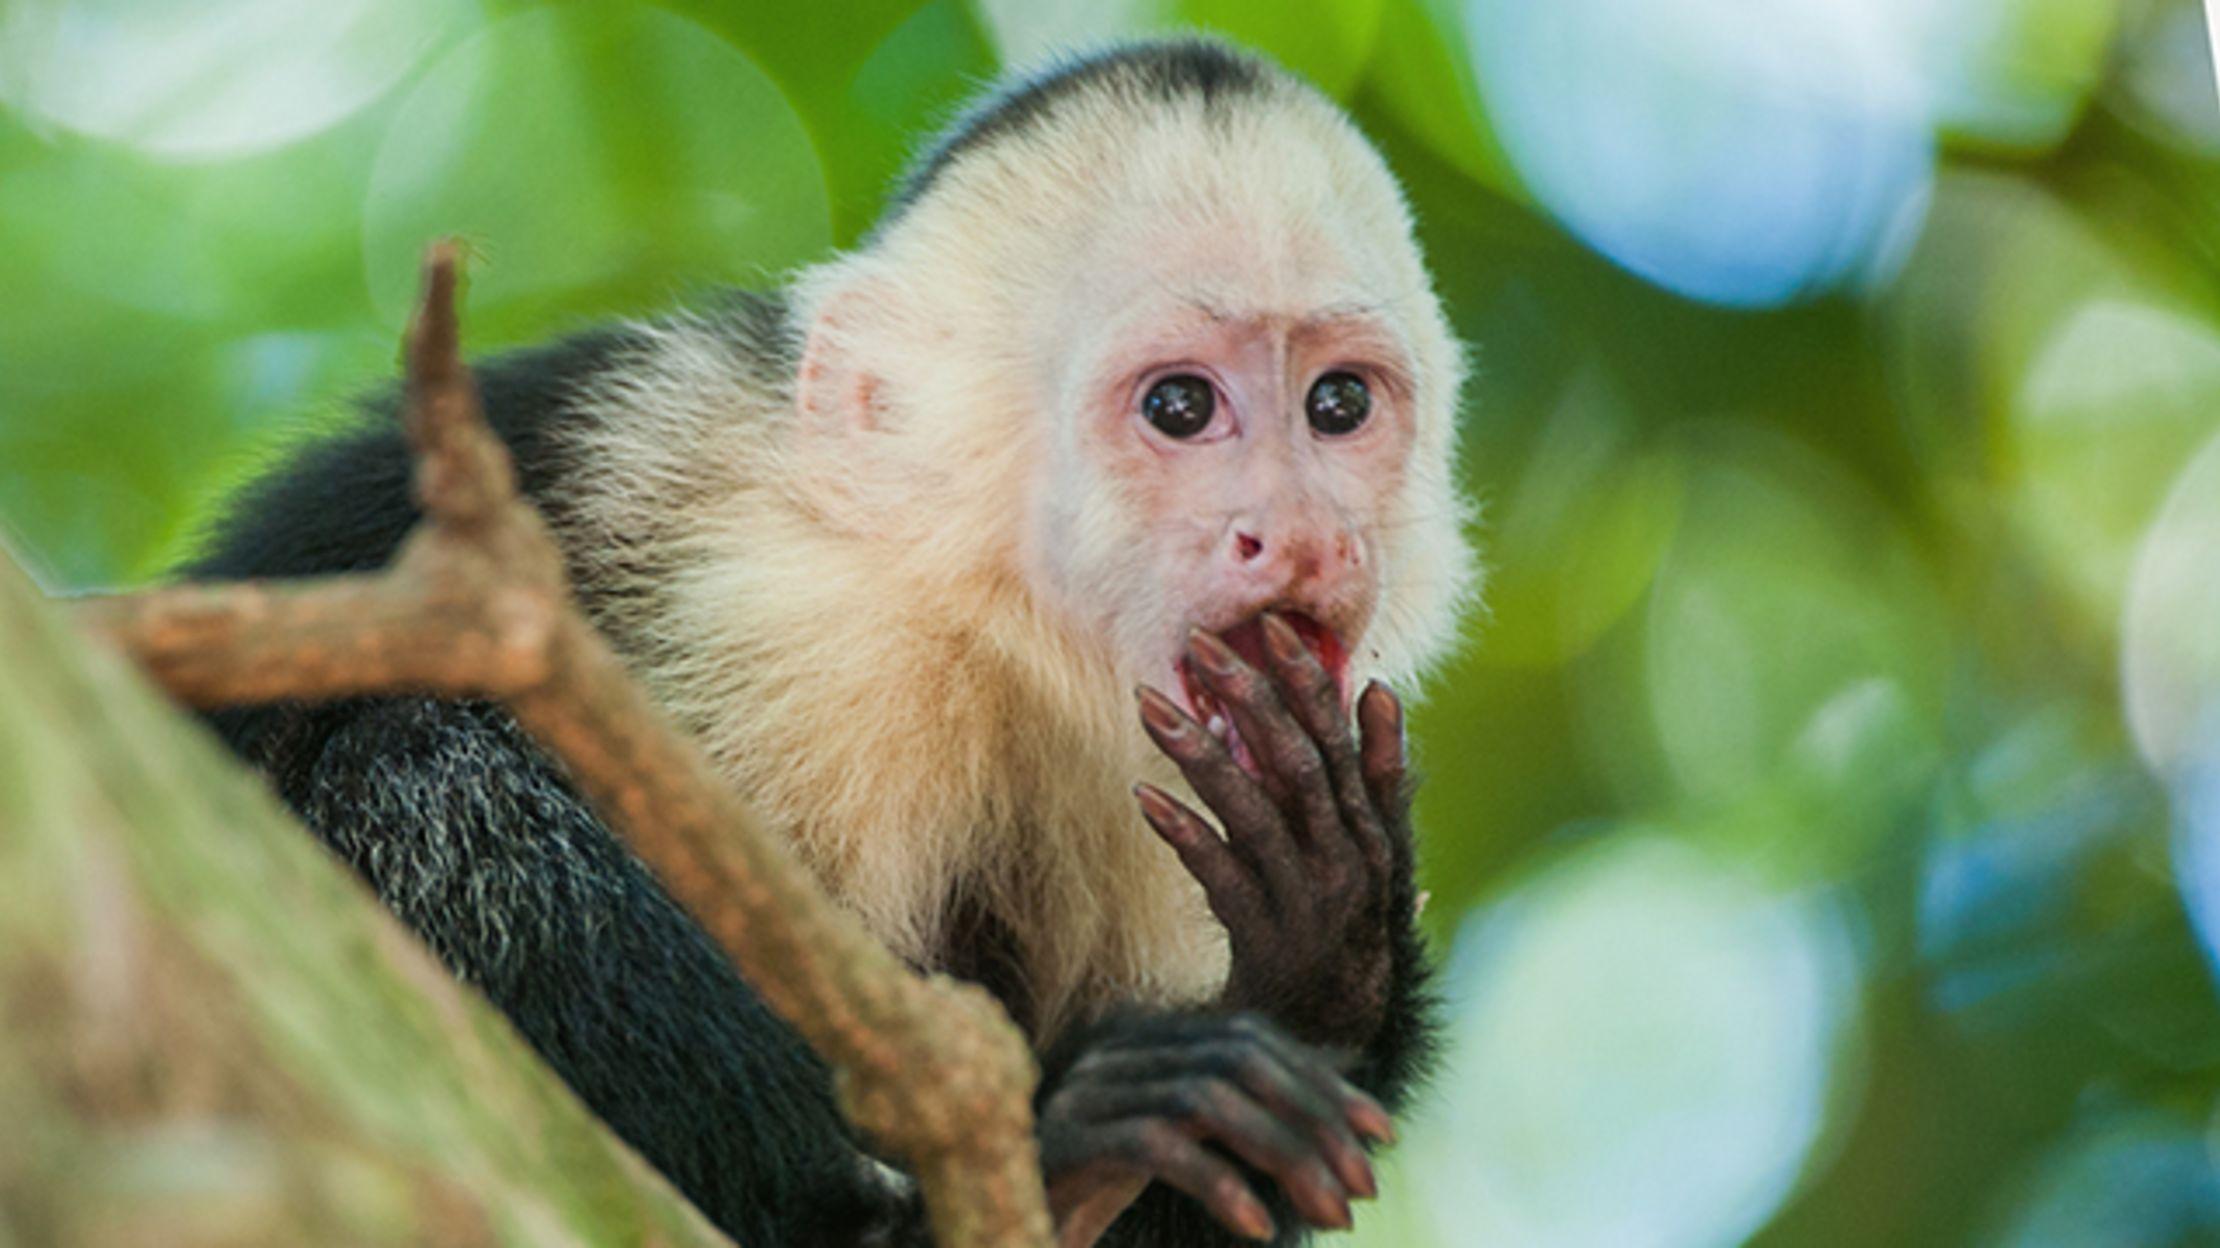 11 Mischievous Facts About Capuchin Monkeys | Mental Floss